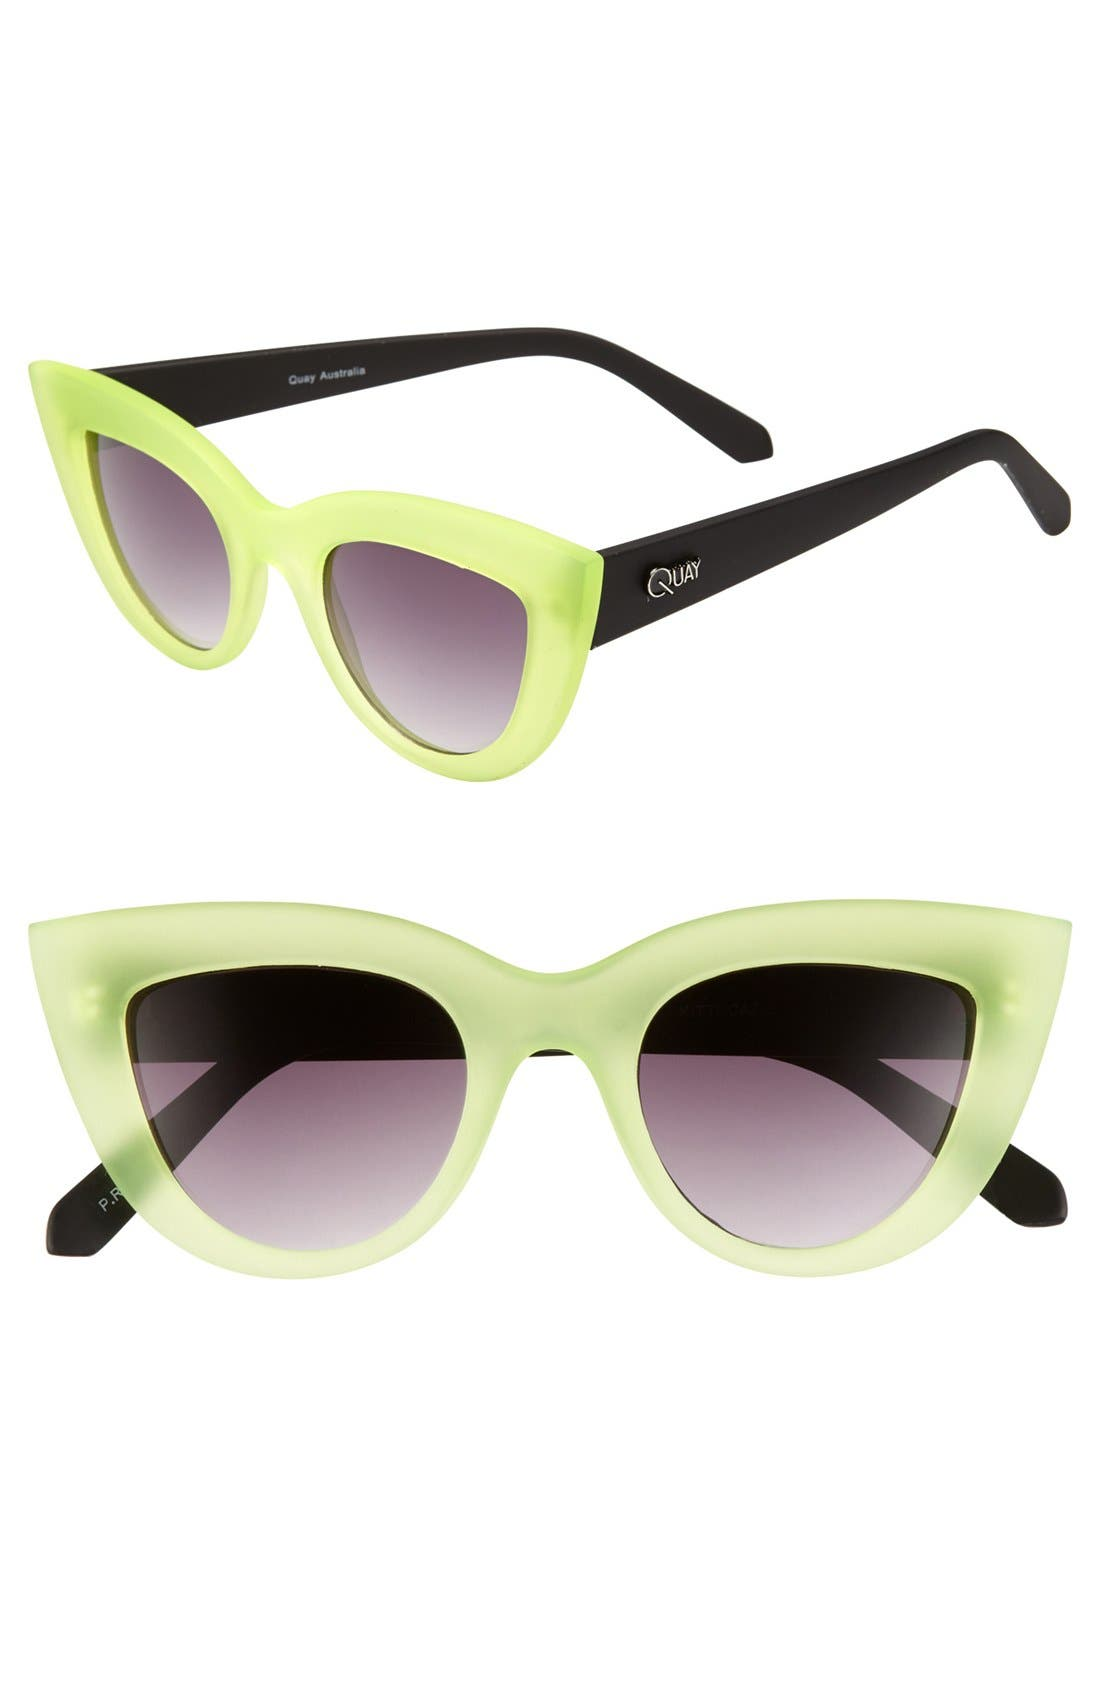 Main Image - Quay 'Kitti' Sunglasses